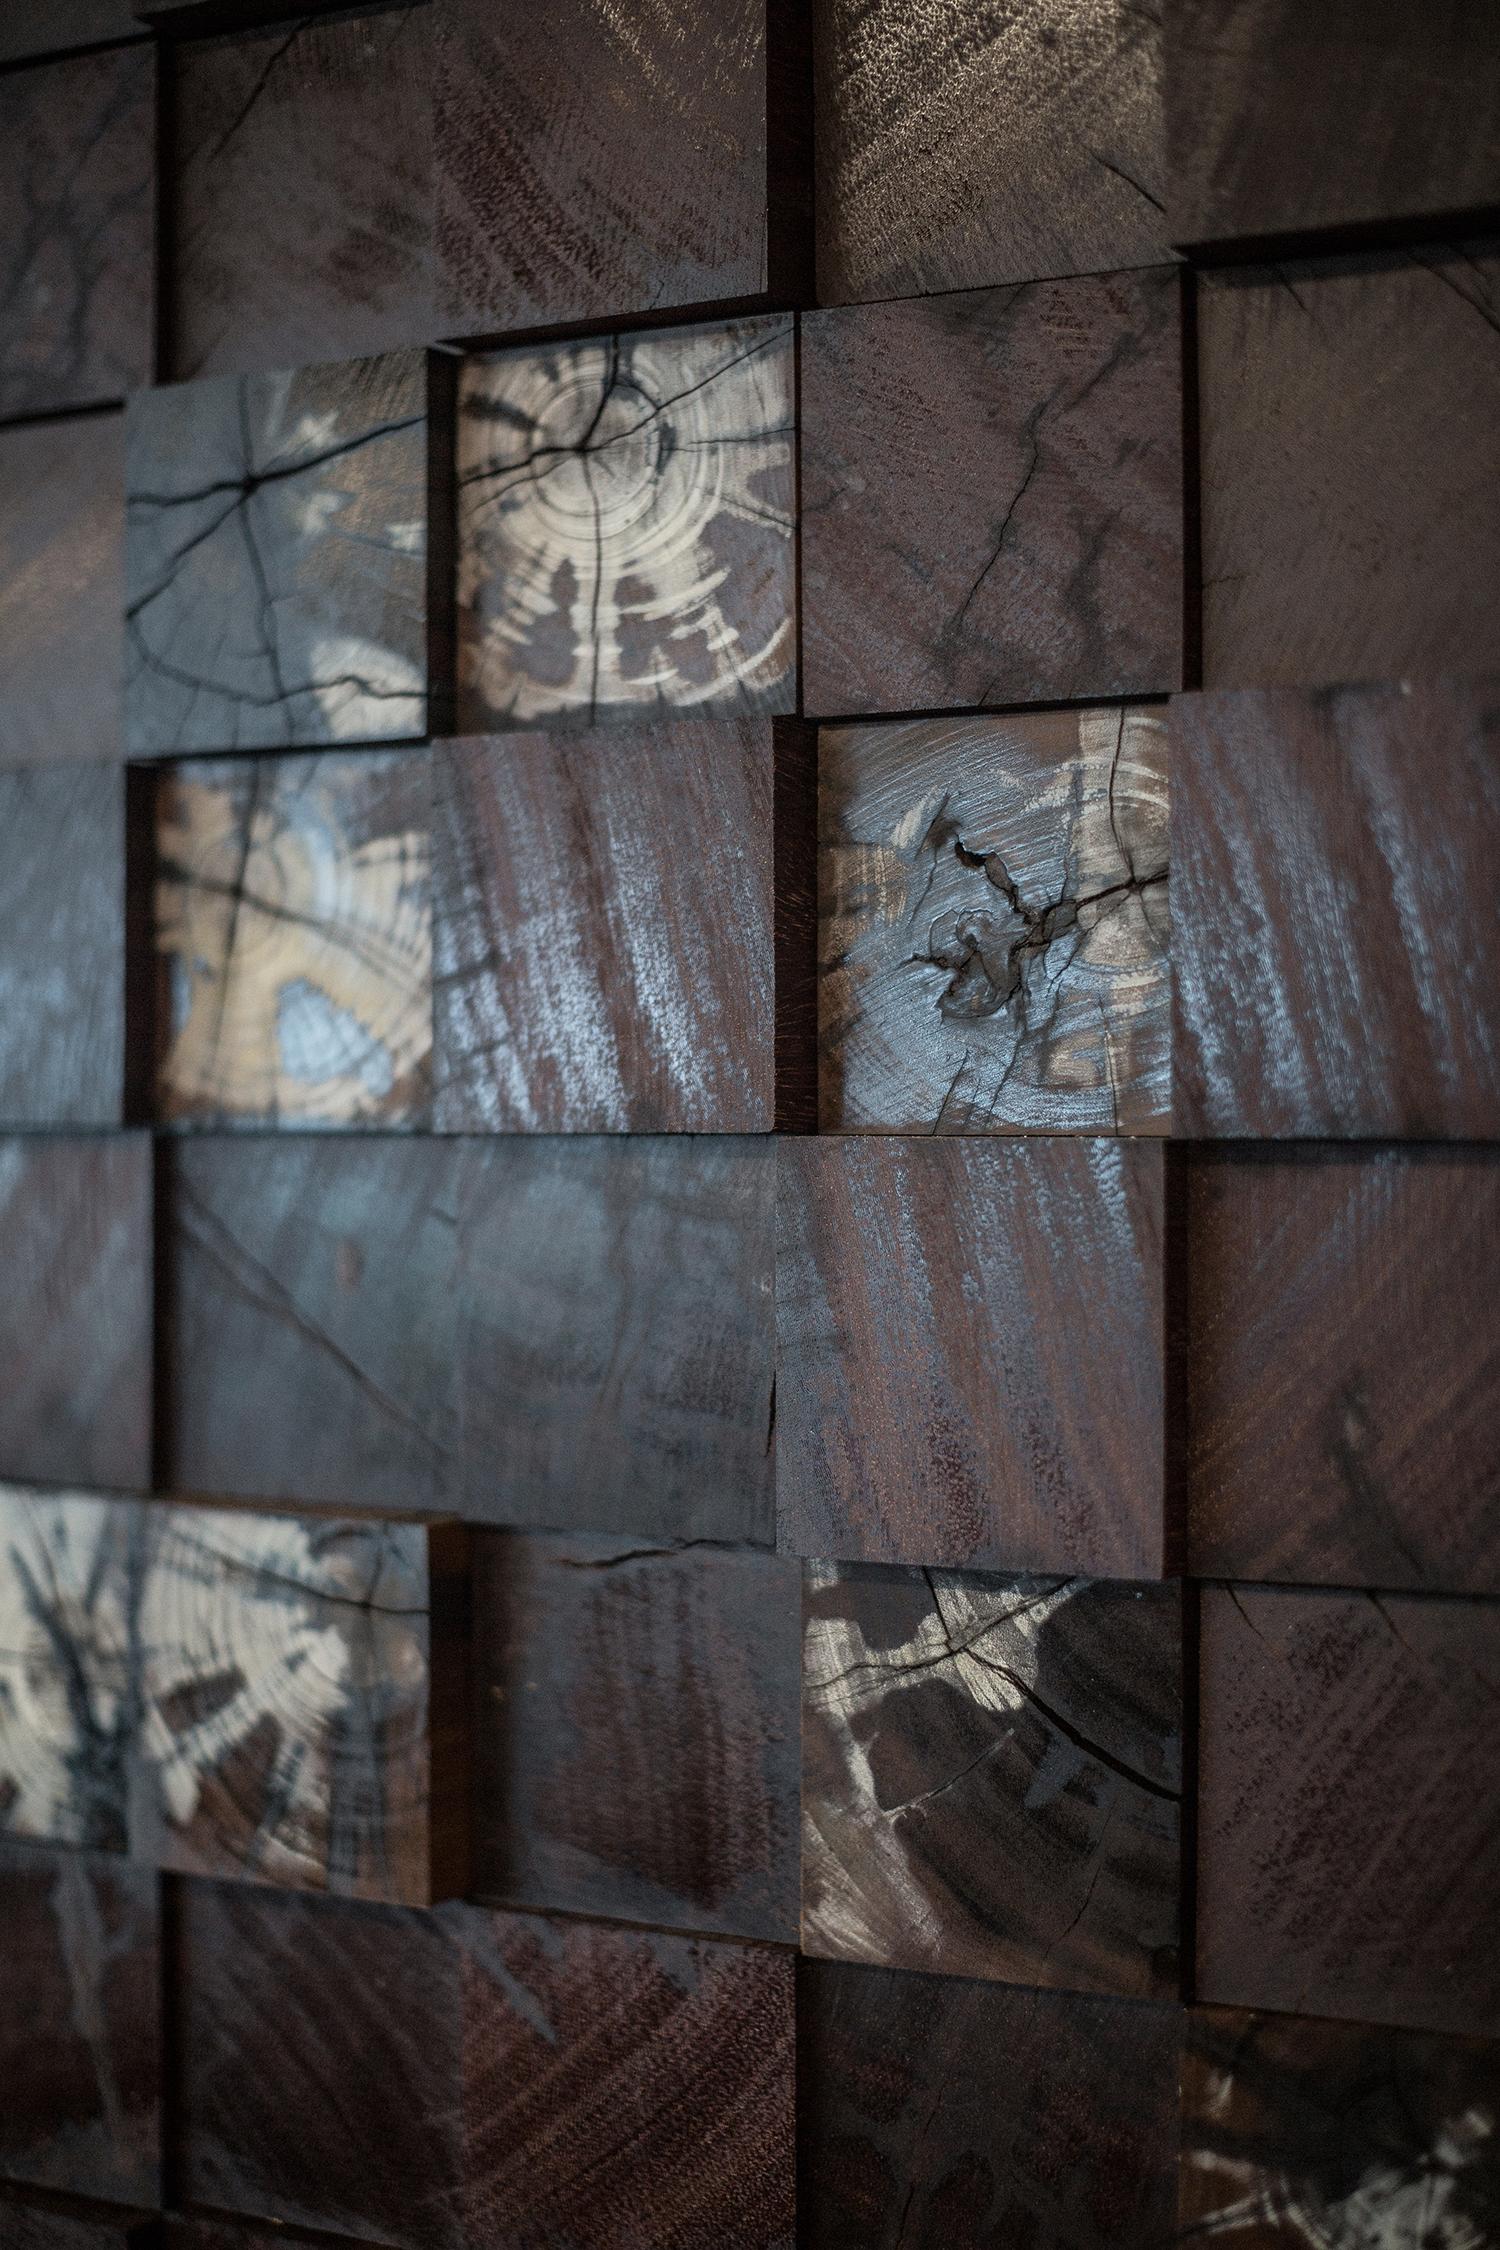 Rustbelt_20150821-0517.jpg